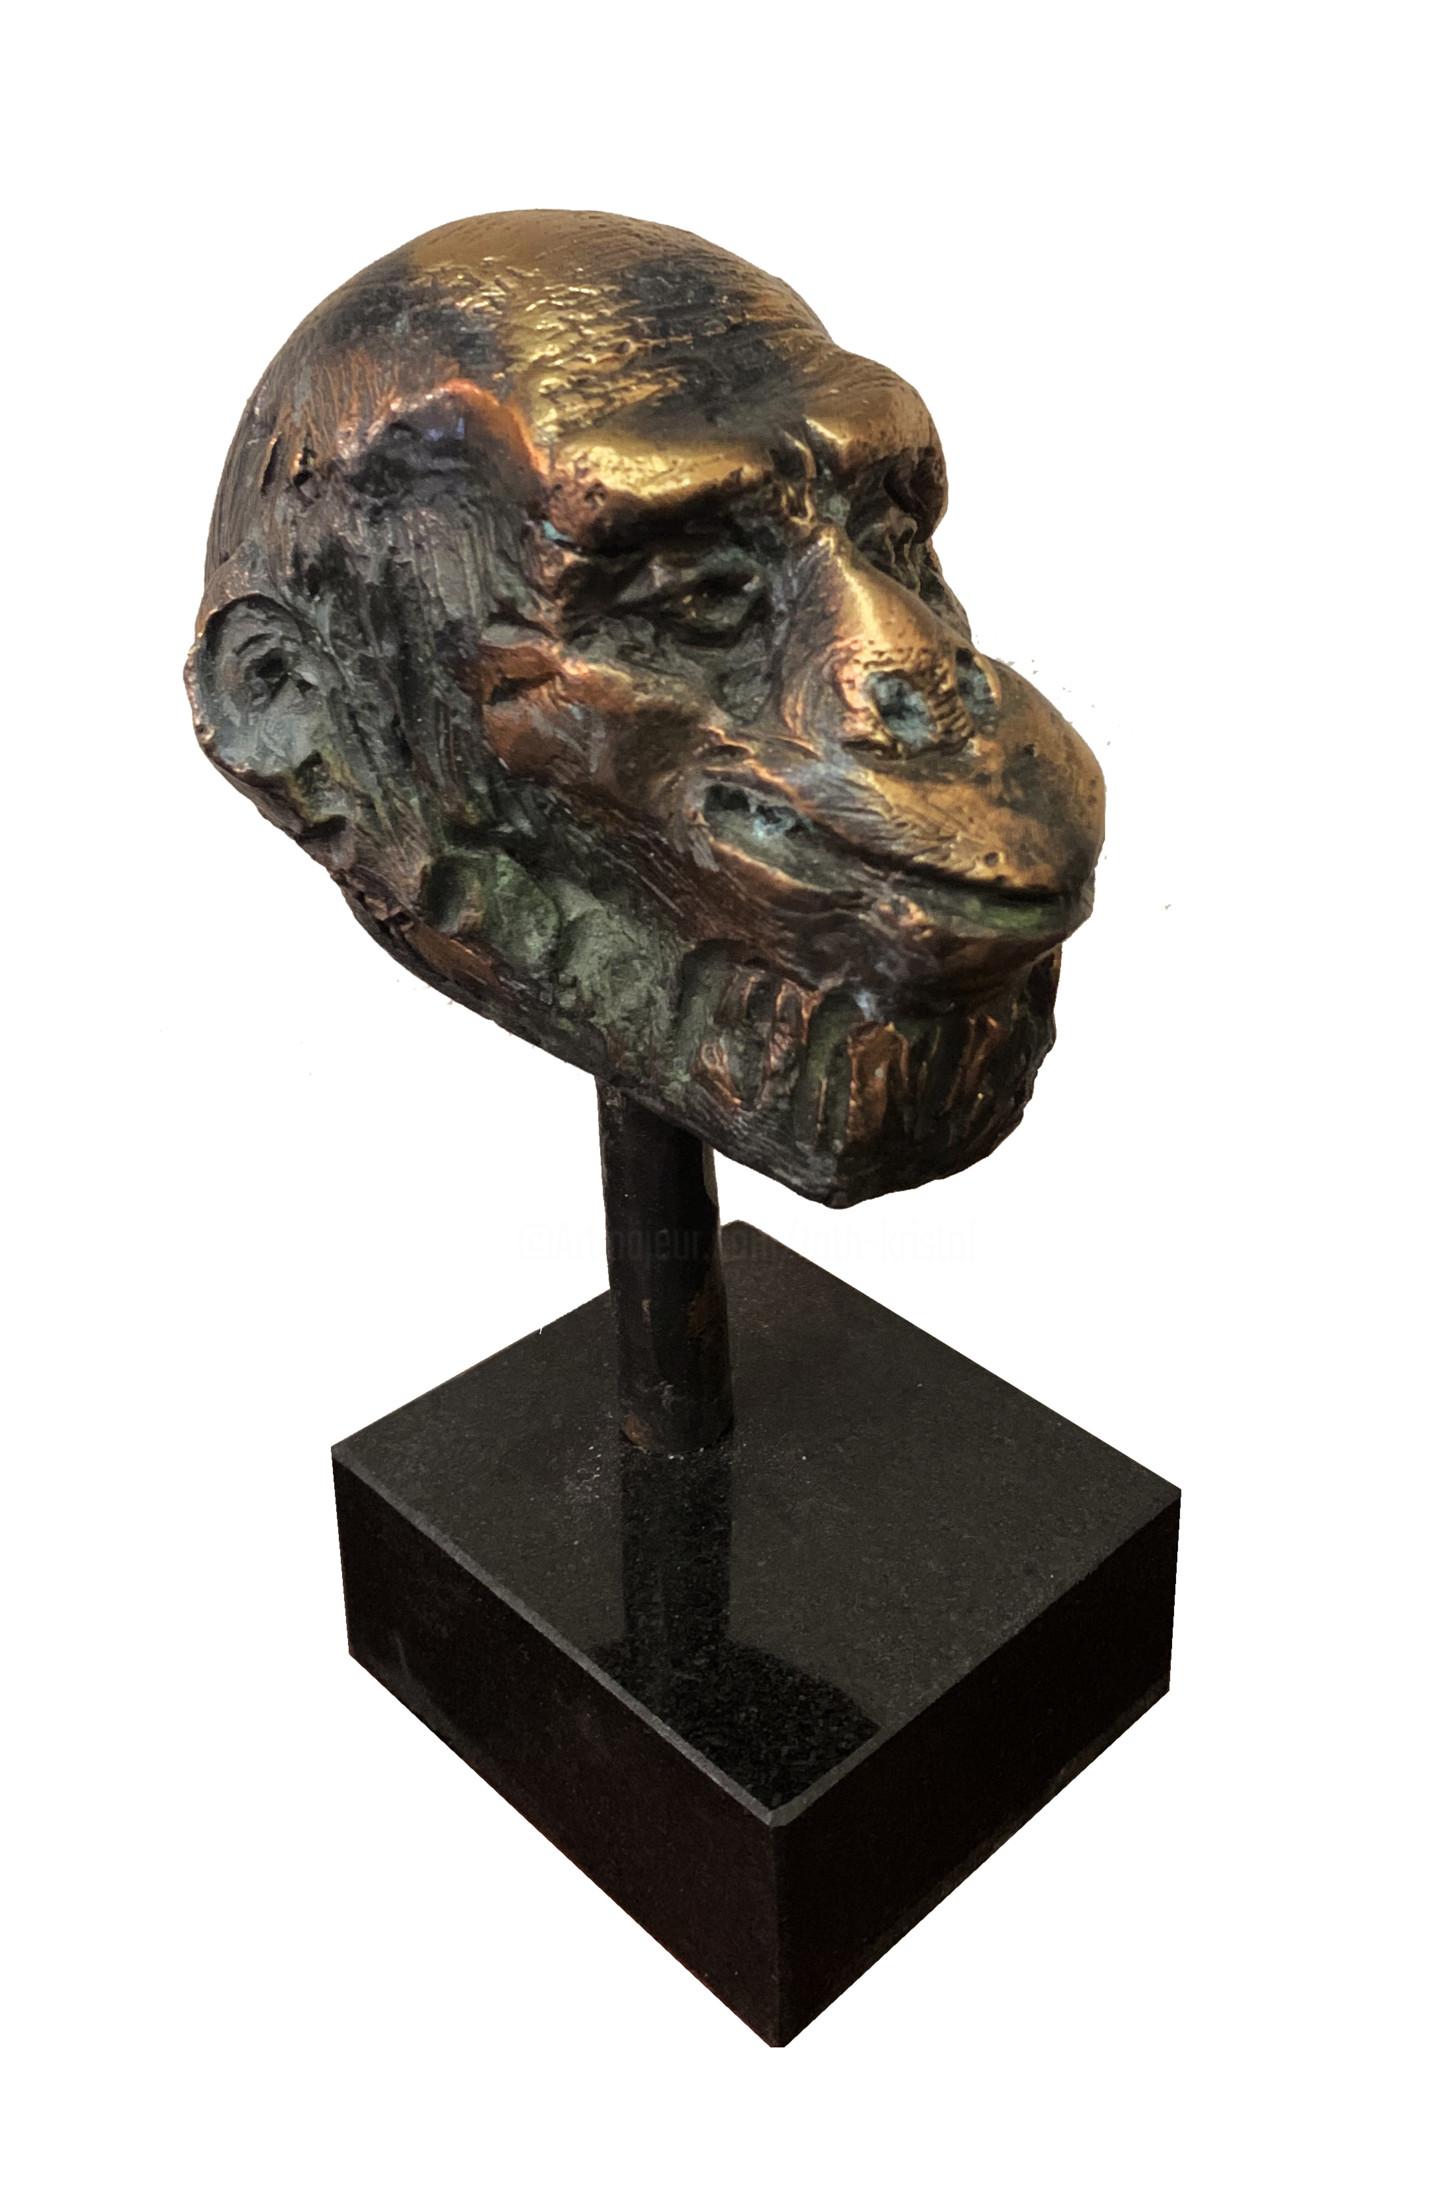 Kristof Toth - Monkey head